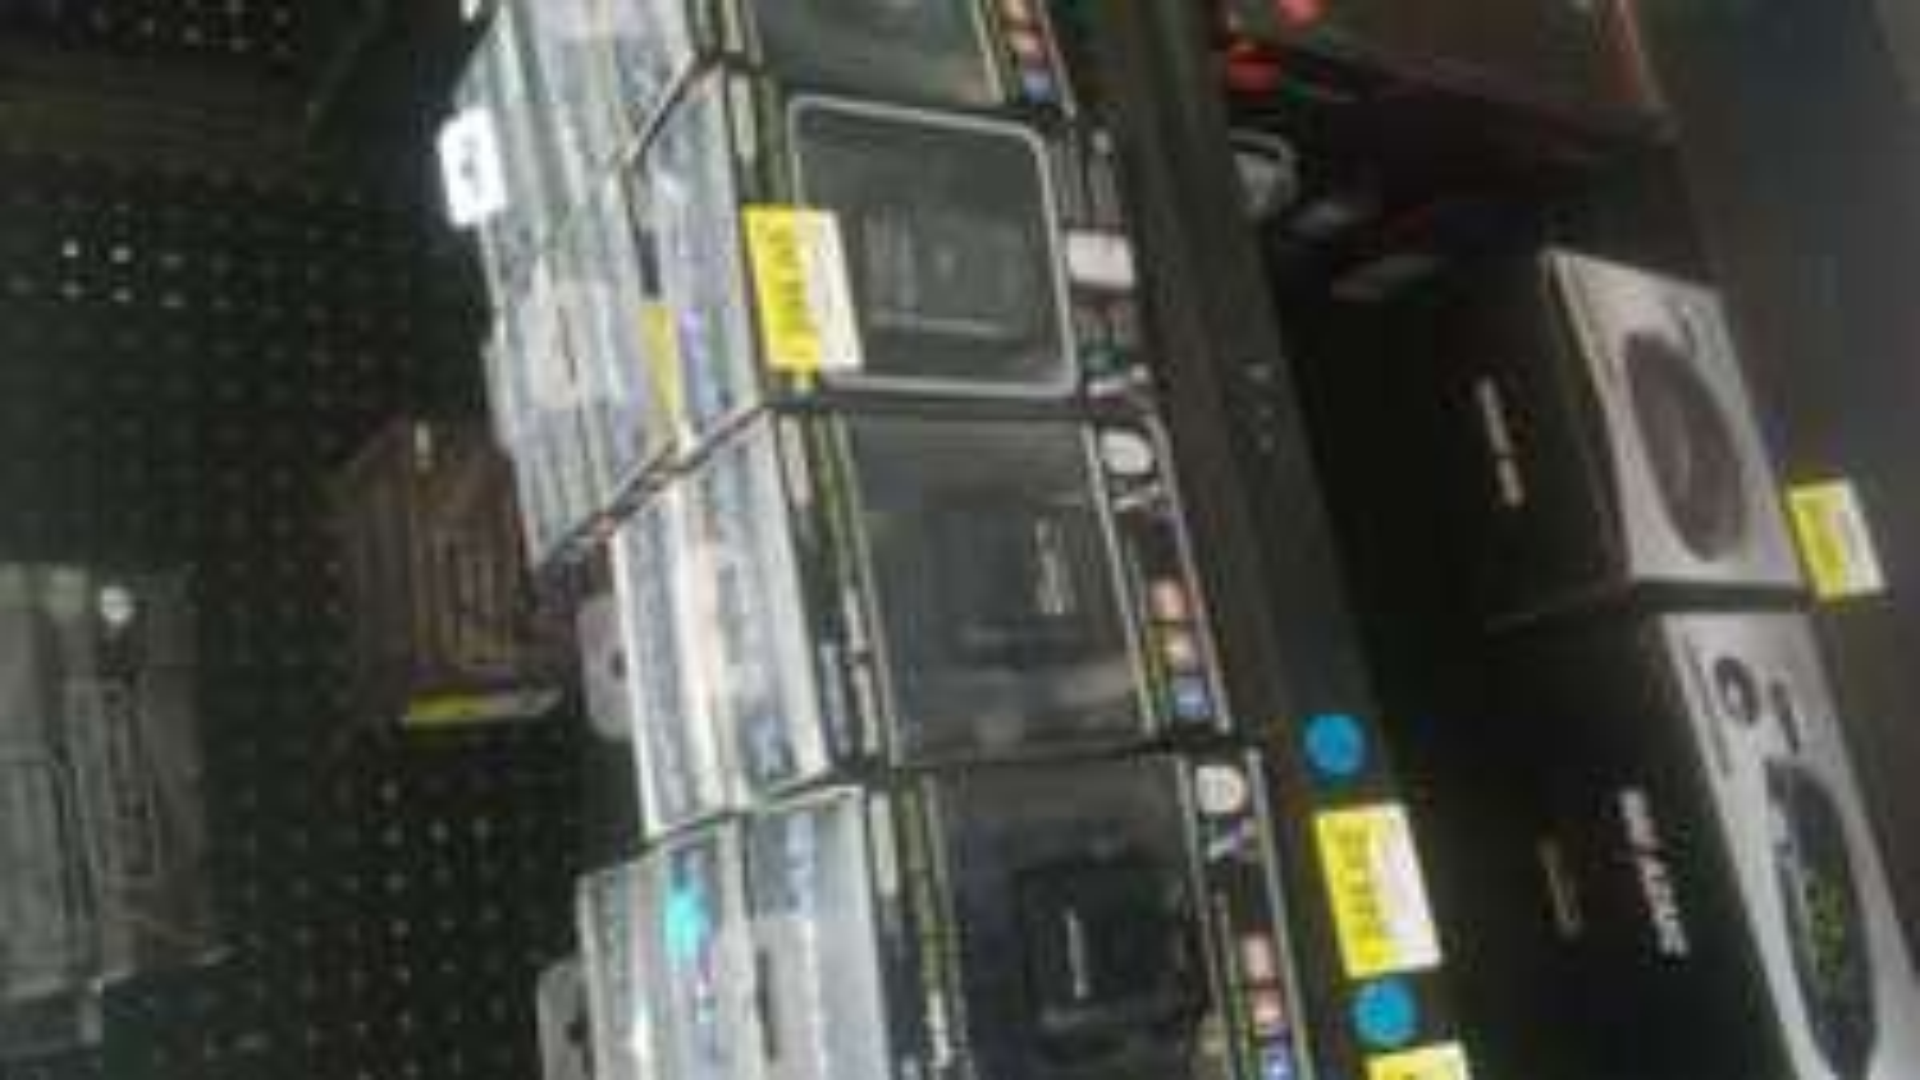 Walmart Hidalgo Tampico-Bocina Bluetooth Recargable $169.00